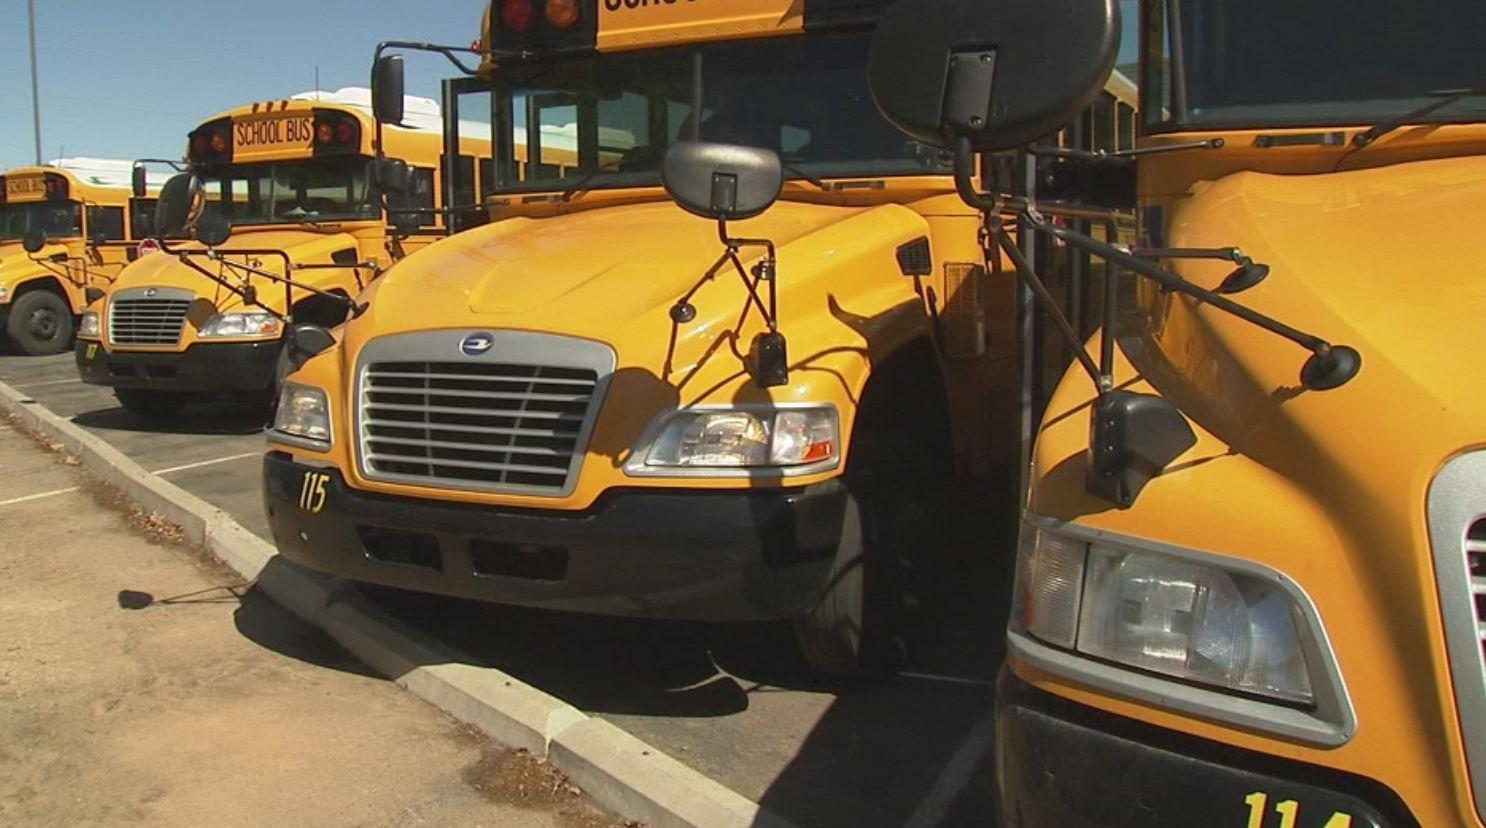 School buses (Source: WGCL)